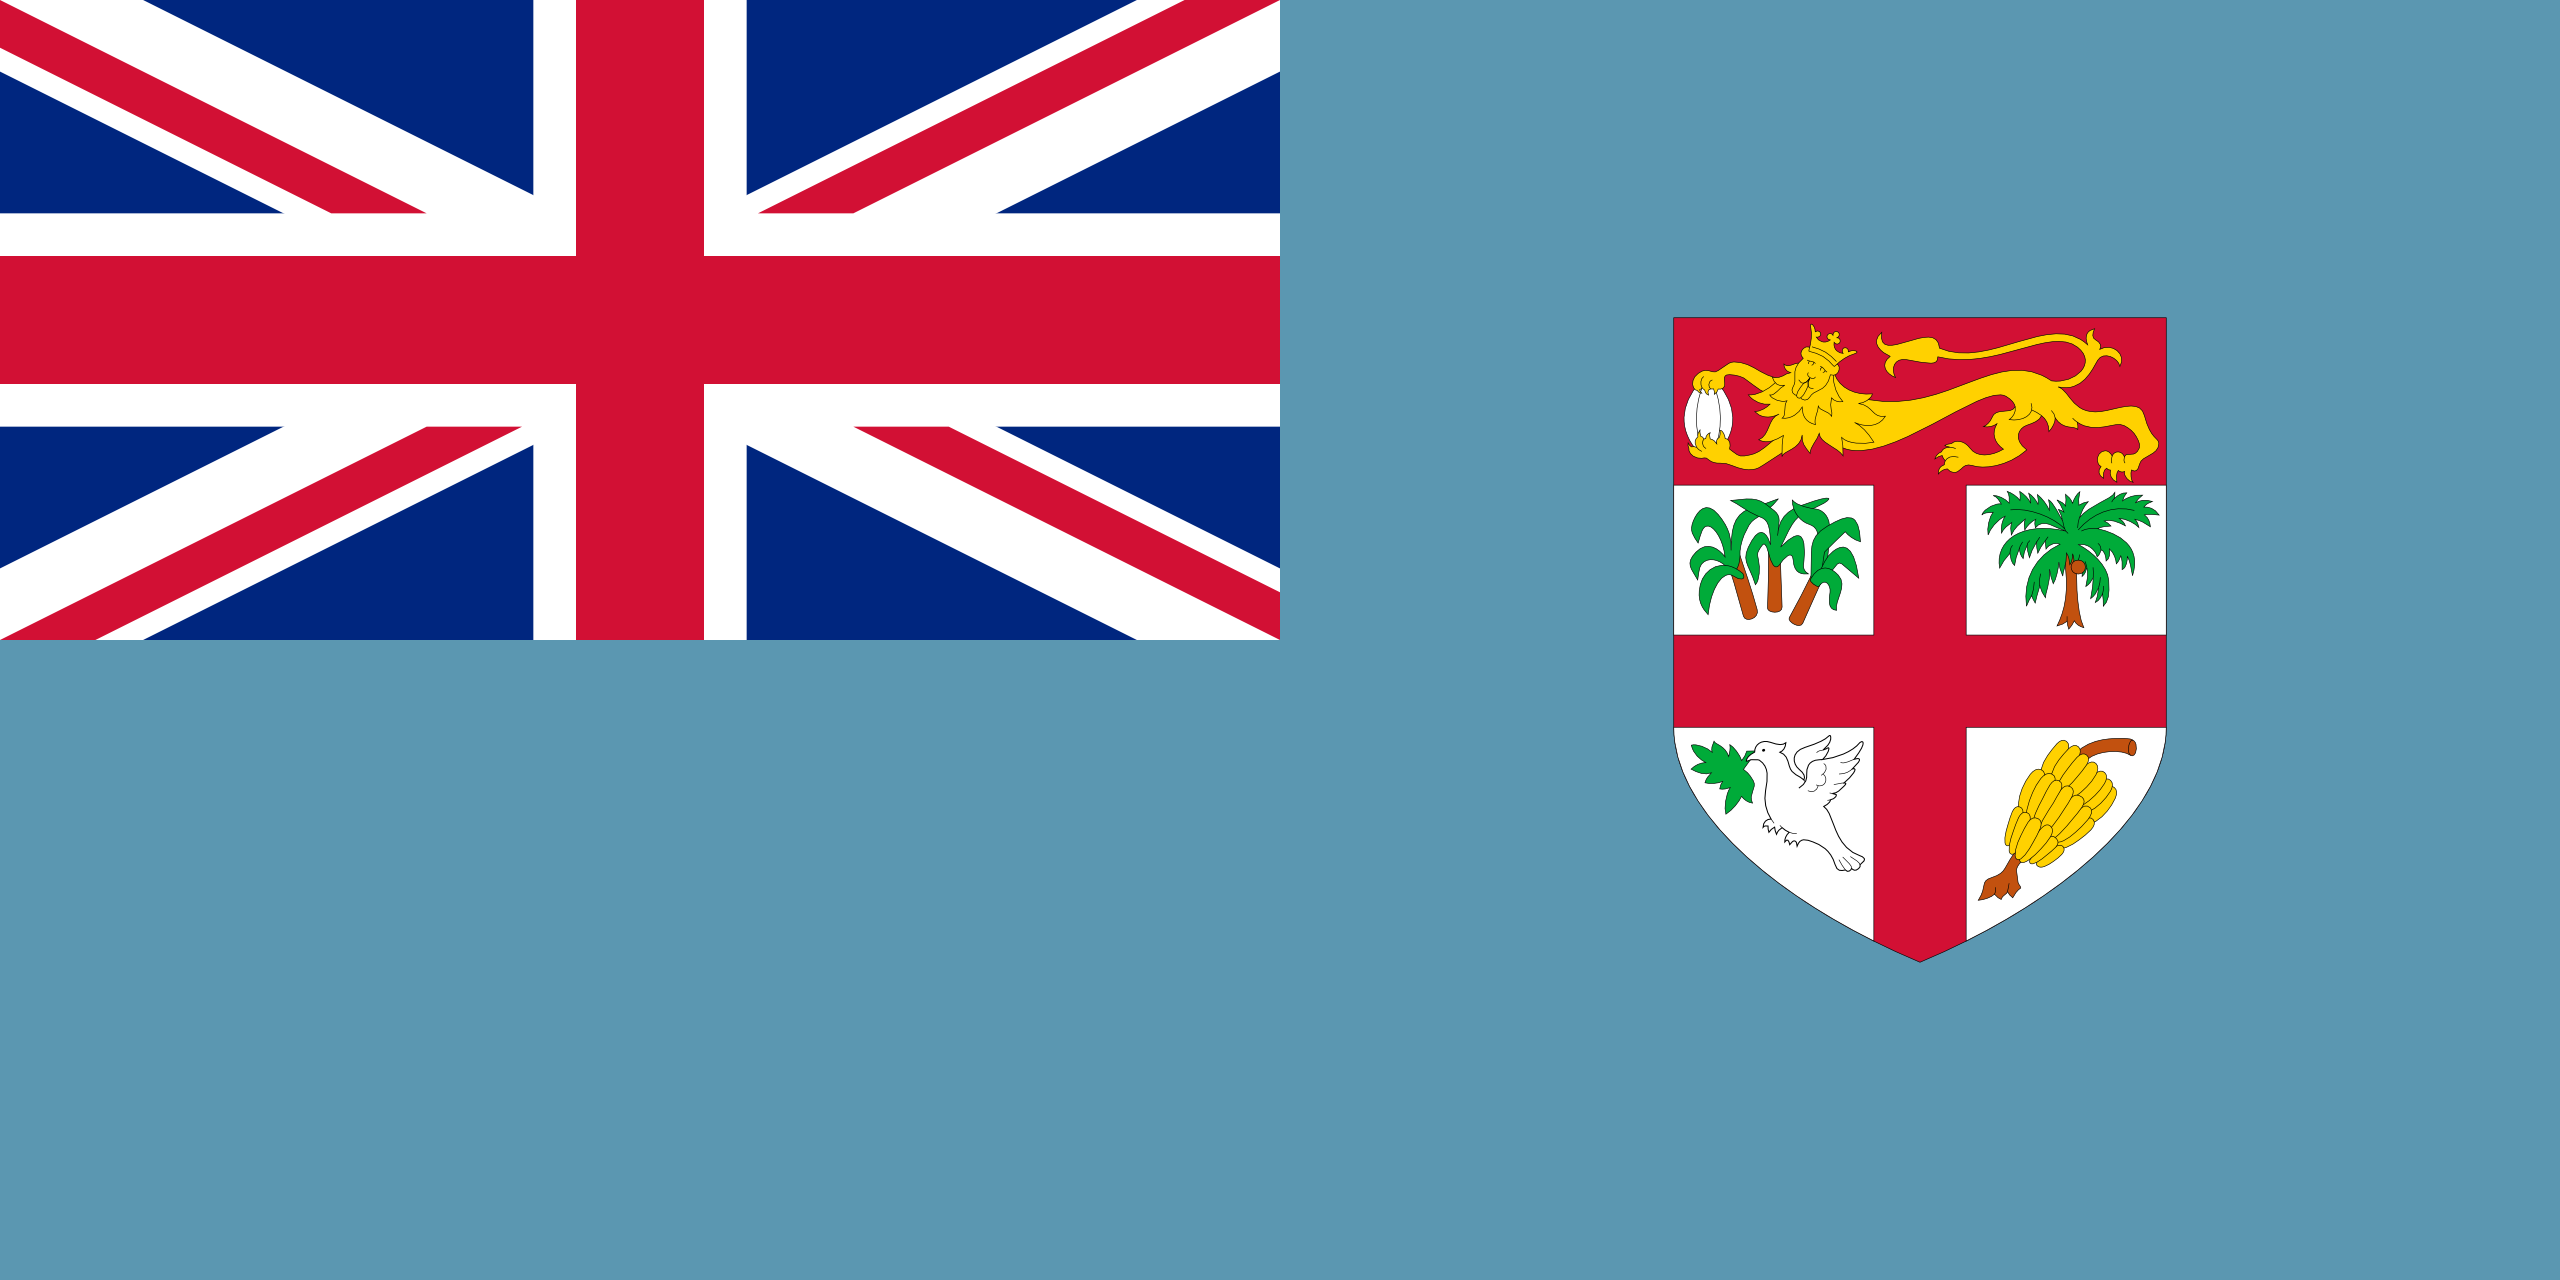 fiyi, país, emblema, insignia, σύμβολο - Wallpapers HD - Professor-falken.com